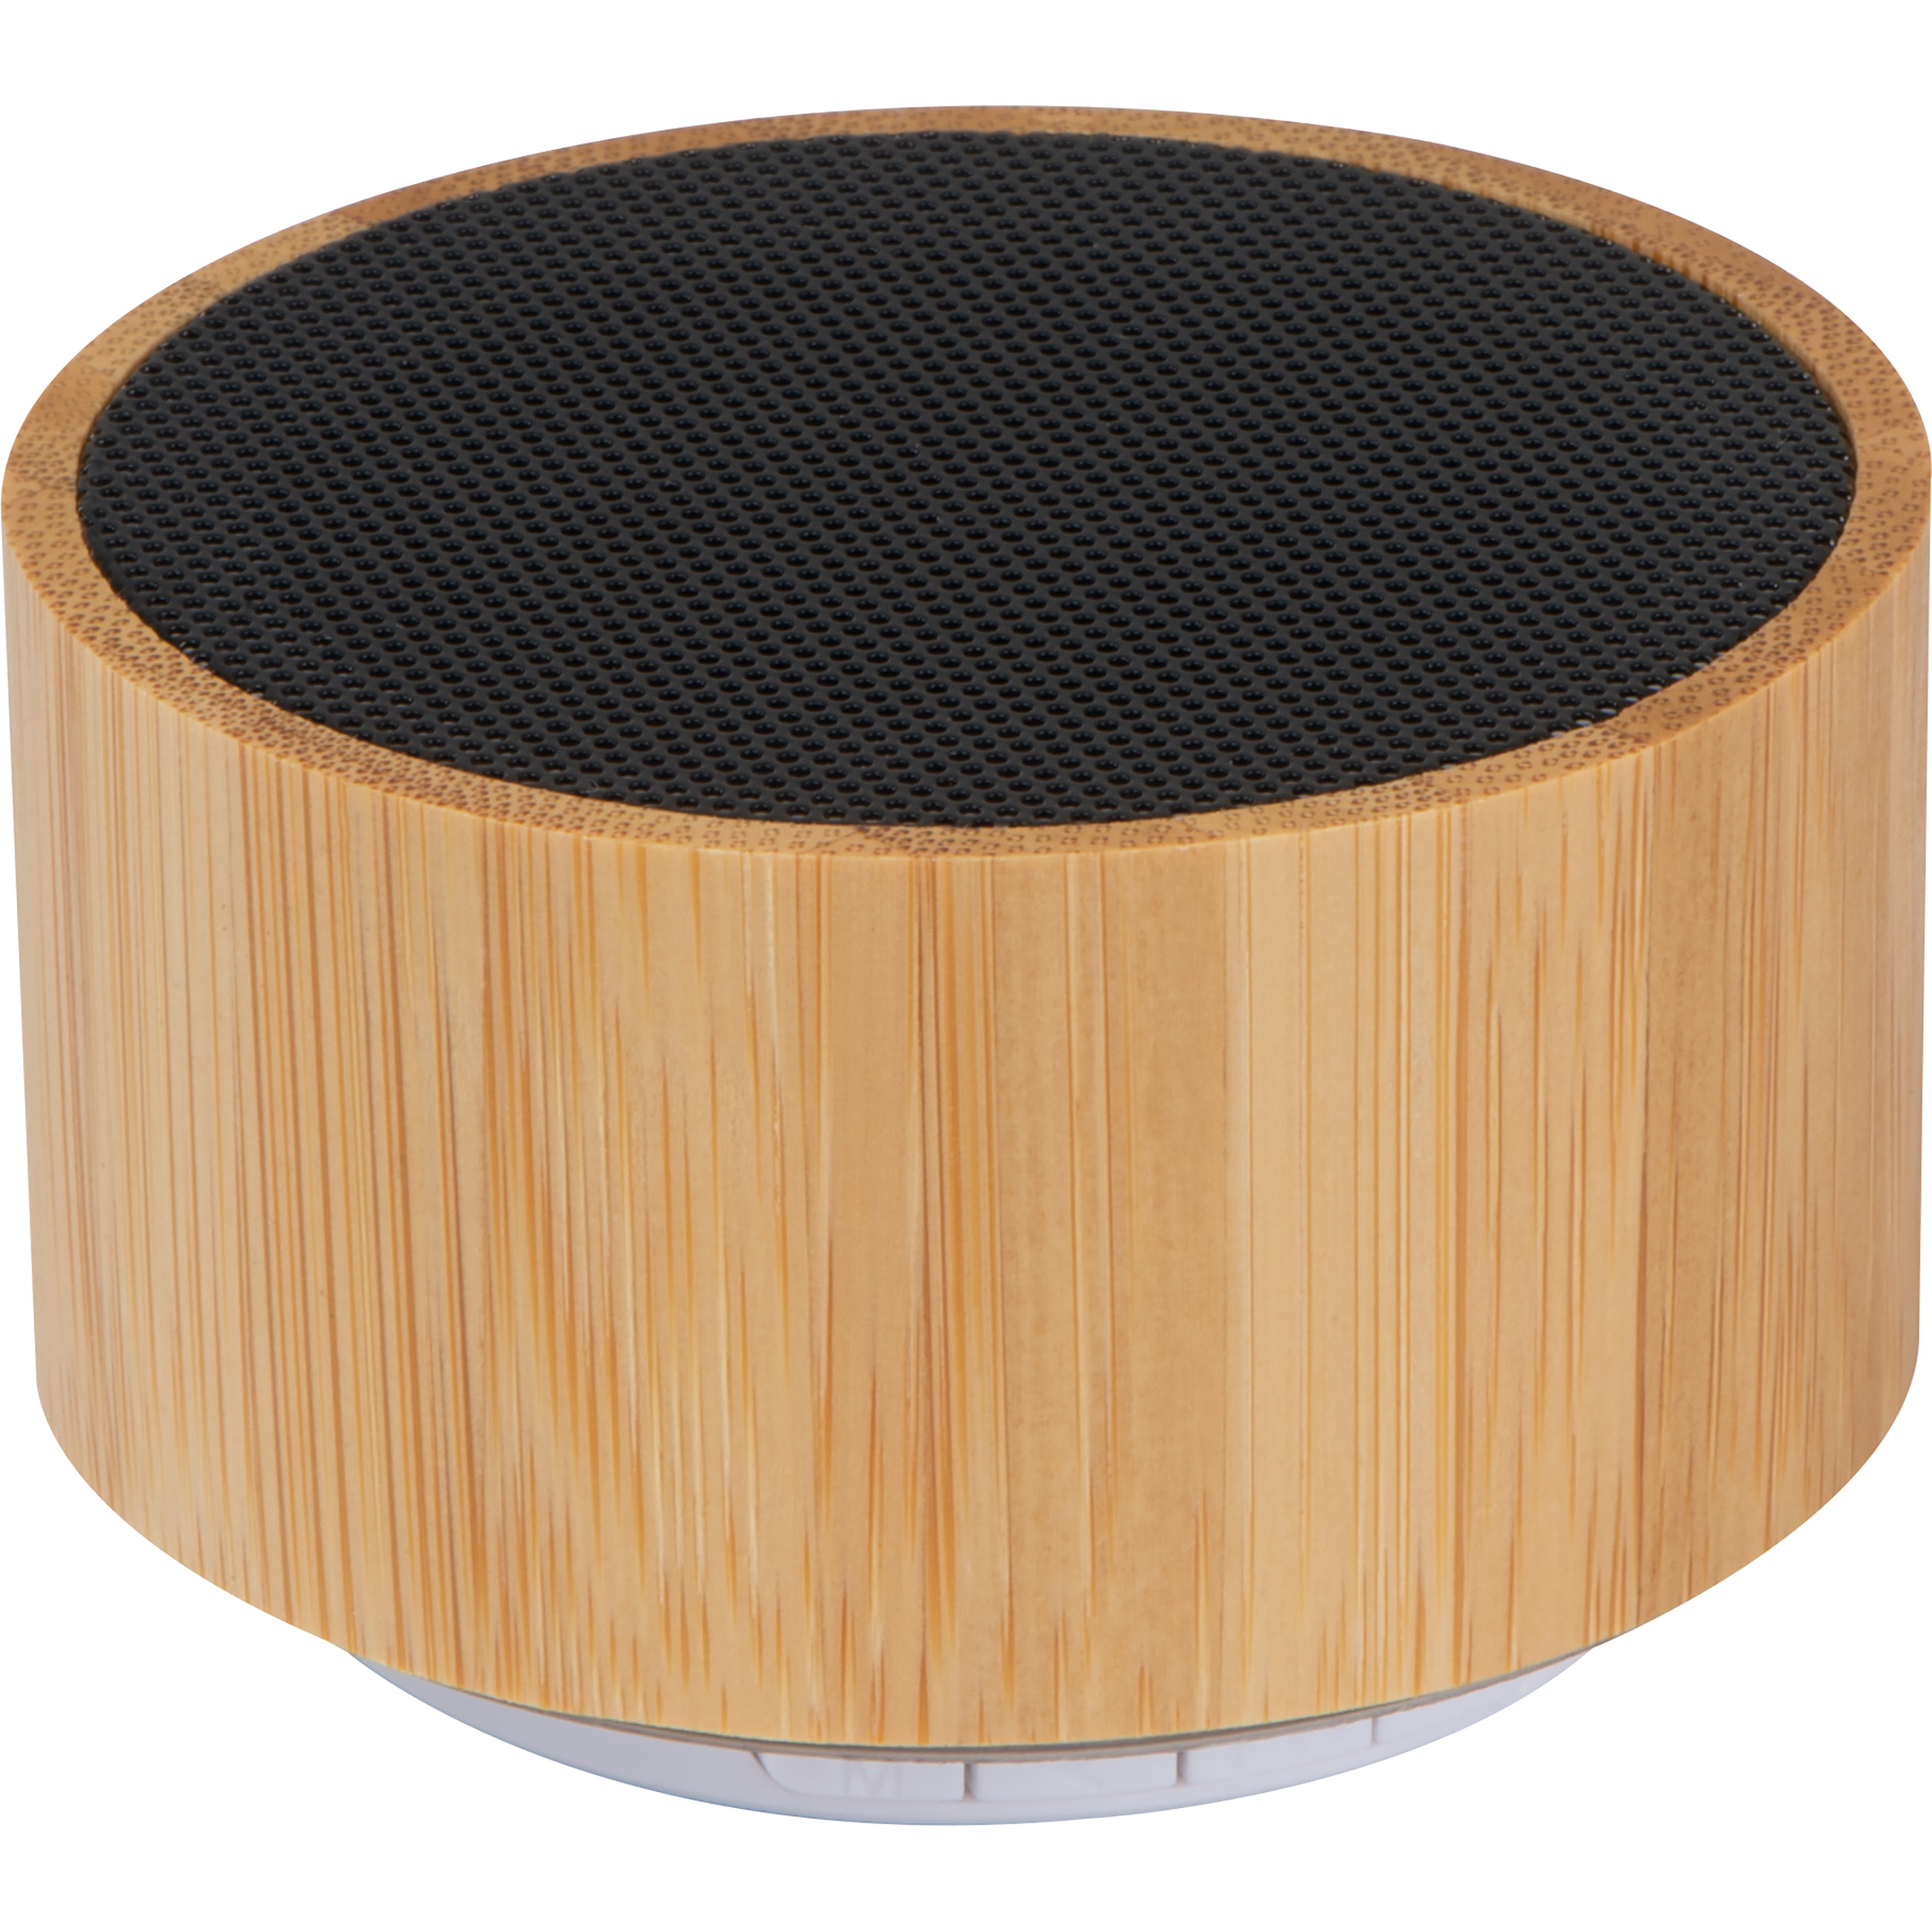 Bluetooth Lautsprecher mit Bambusummantelung